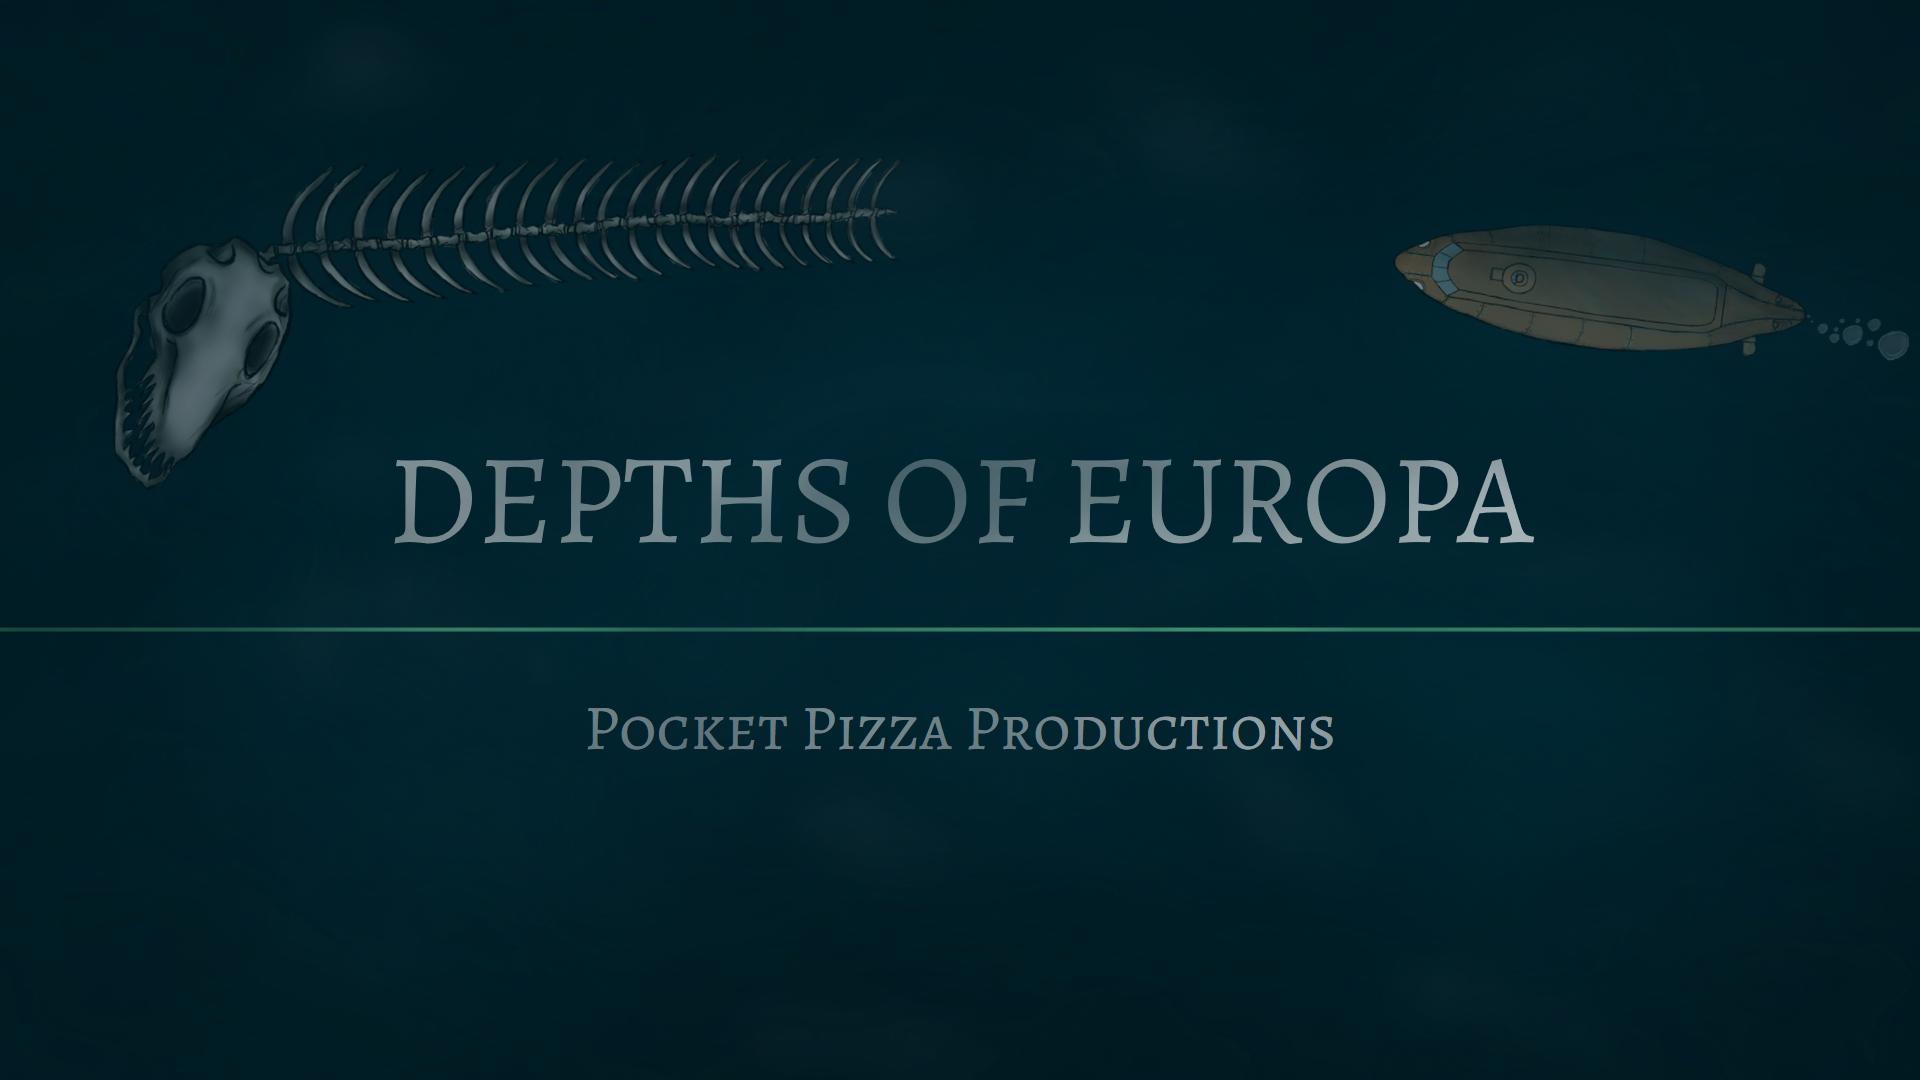 Depths of Europa